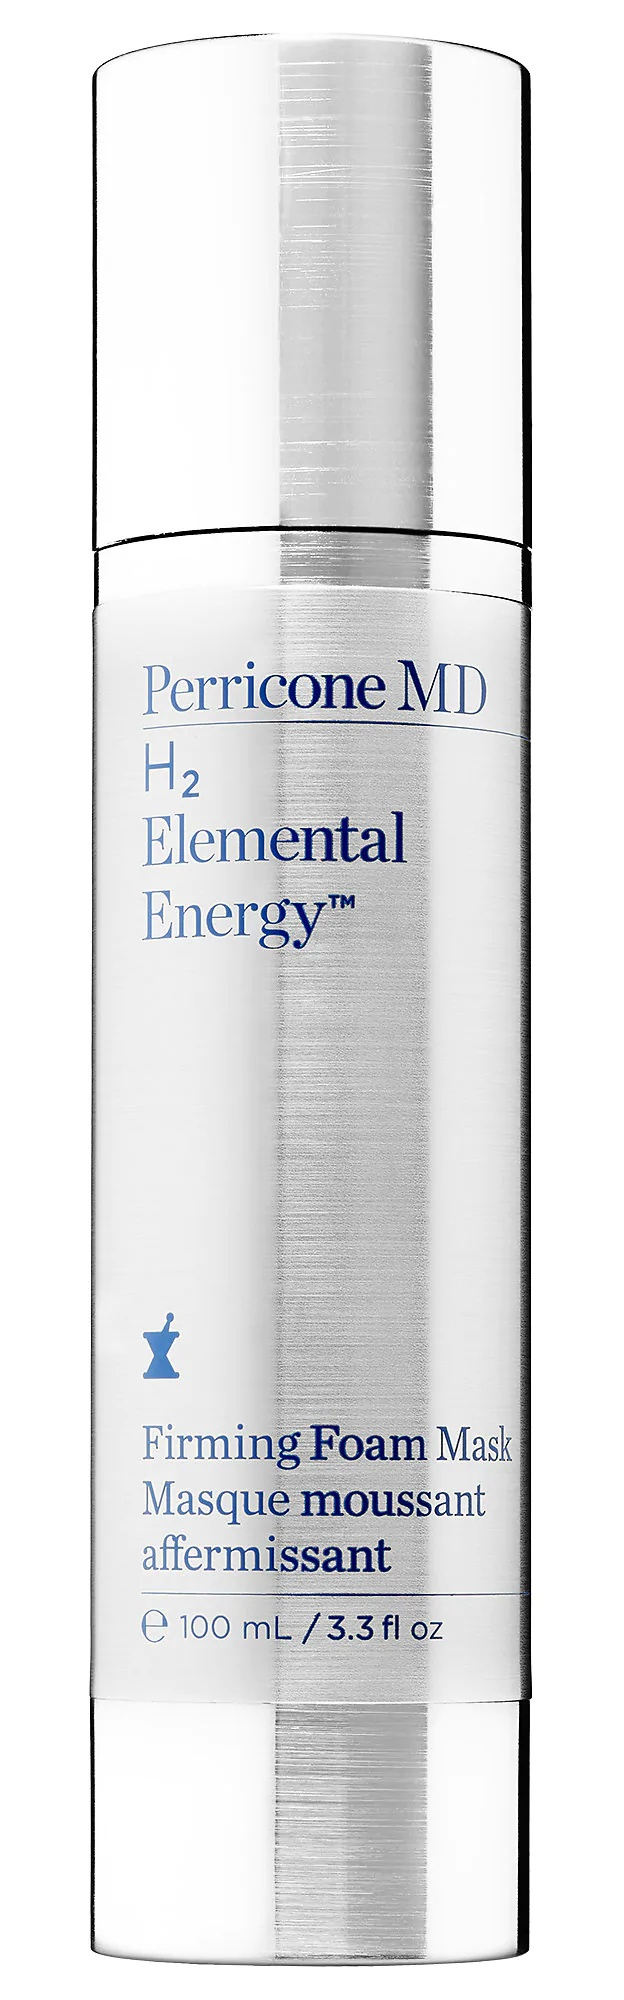 Perricone H2 Elemental Energy Firming Mask